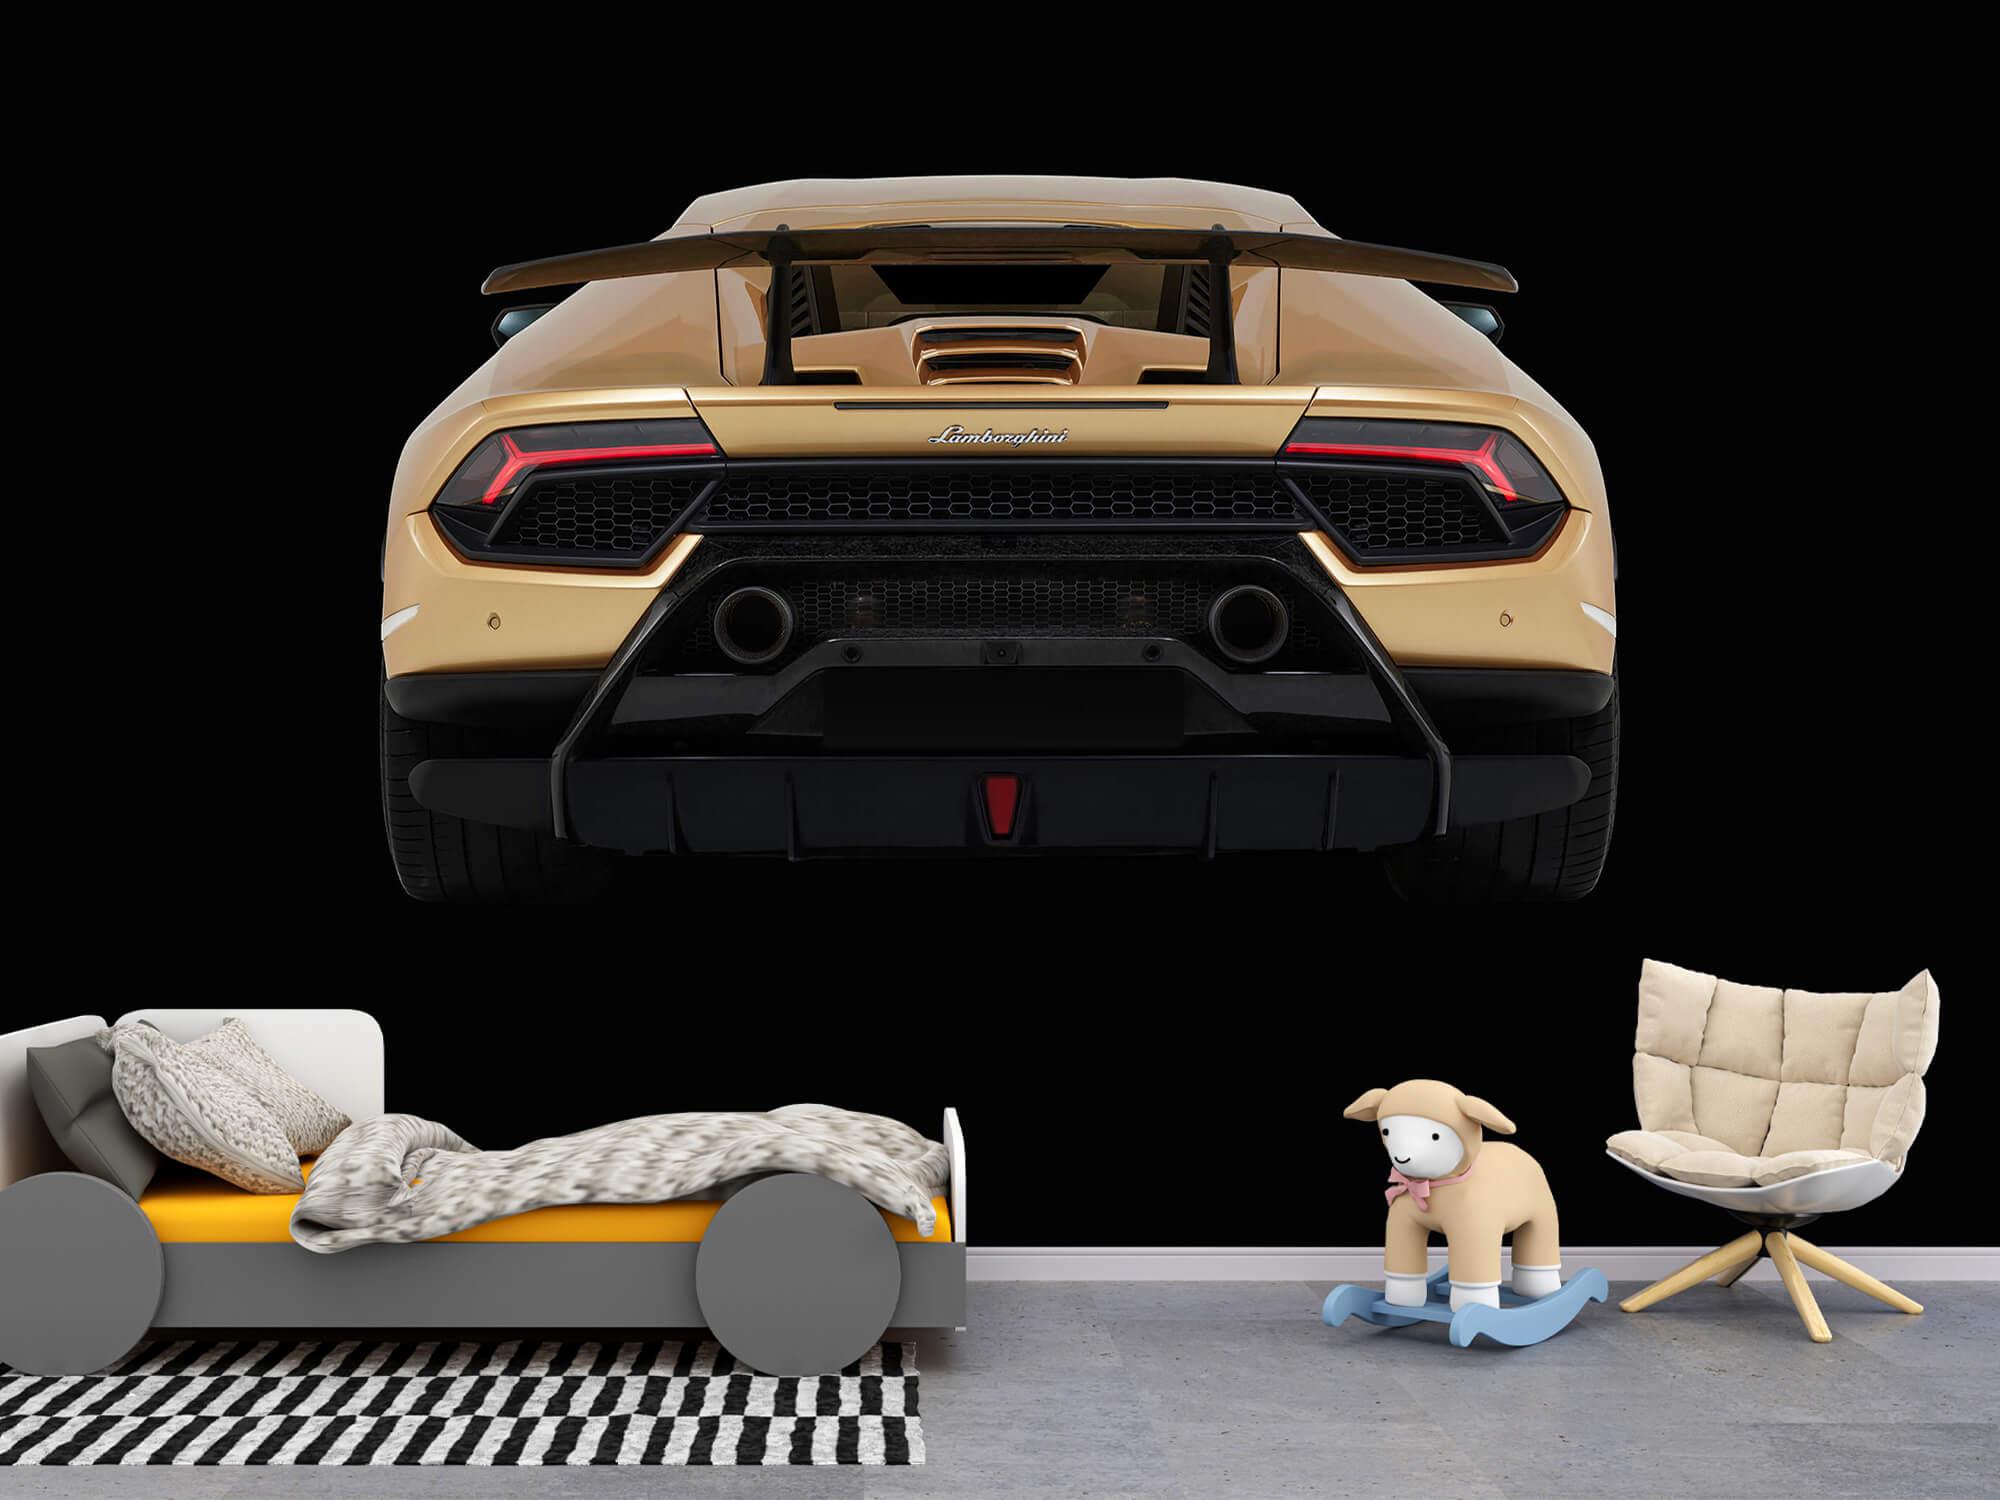 Wallpaper Lamborghini Huracán - Arrière, noir 4